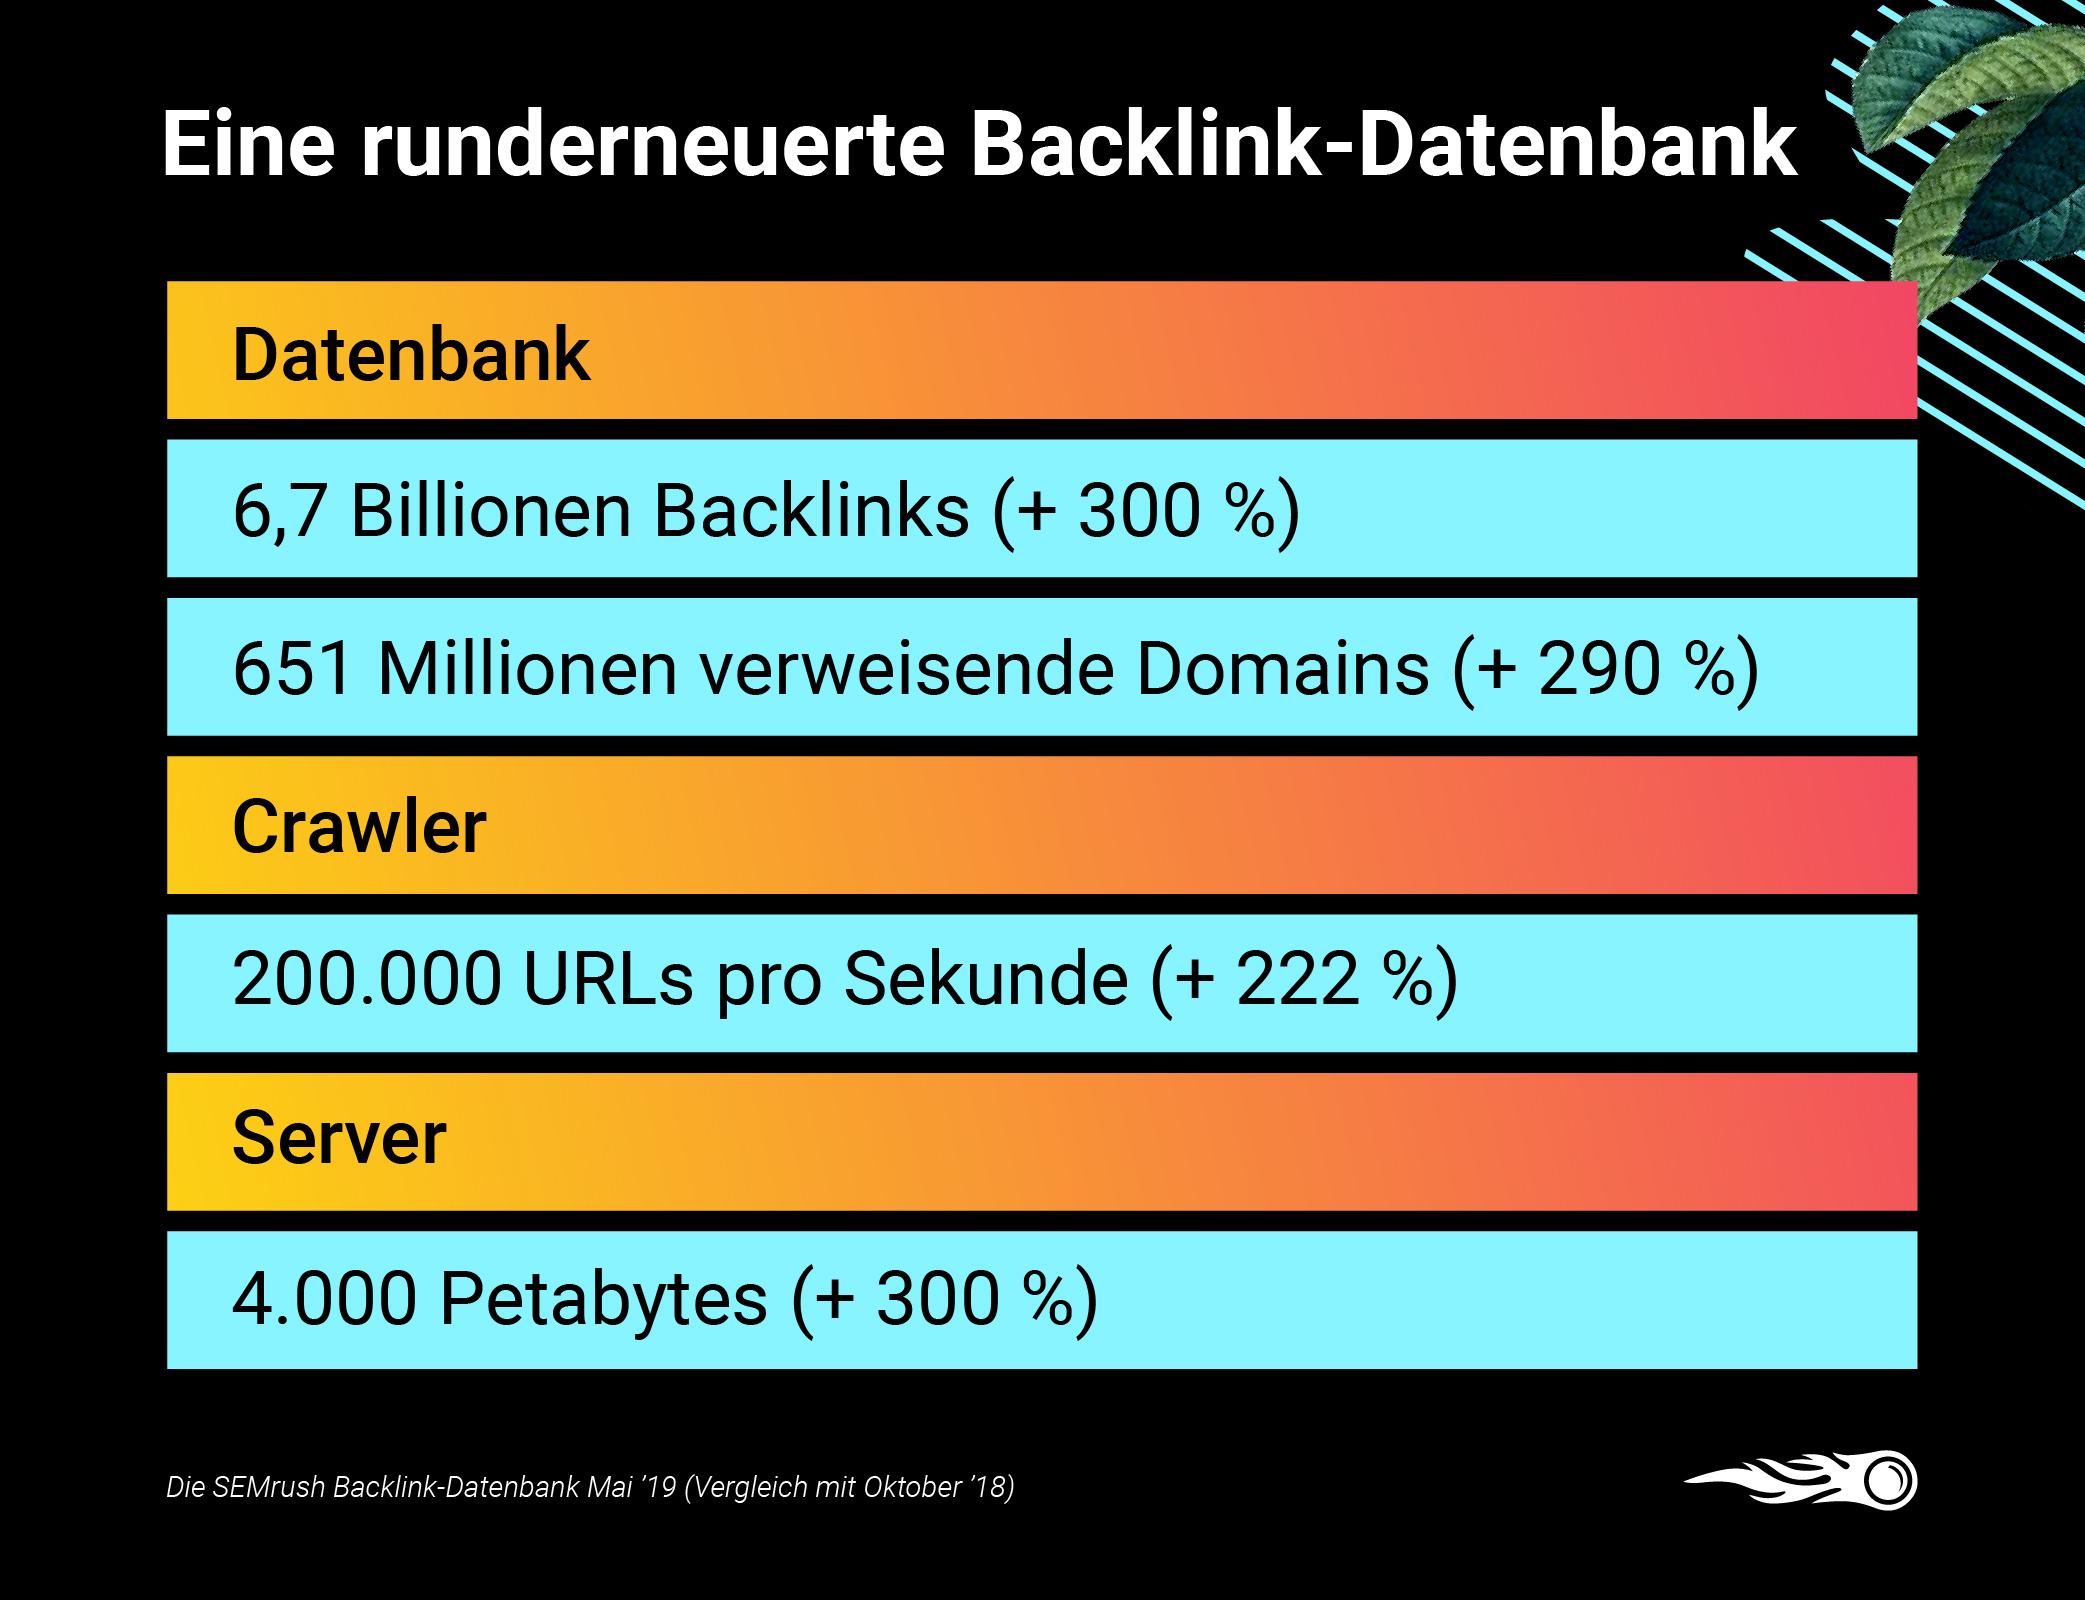 SEMrush vs. Ahrefs vs. Moz vs. Majestic - Backlink-Datenbanken im Vergleich. Bild 2